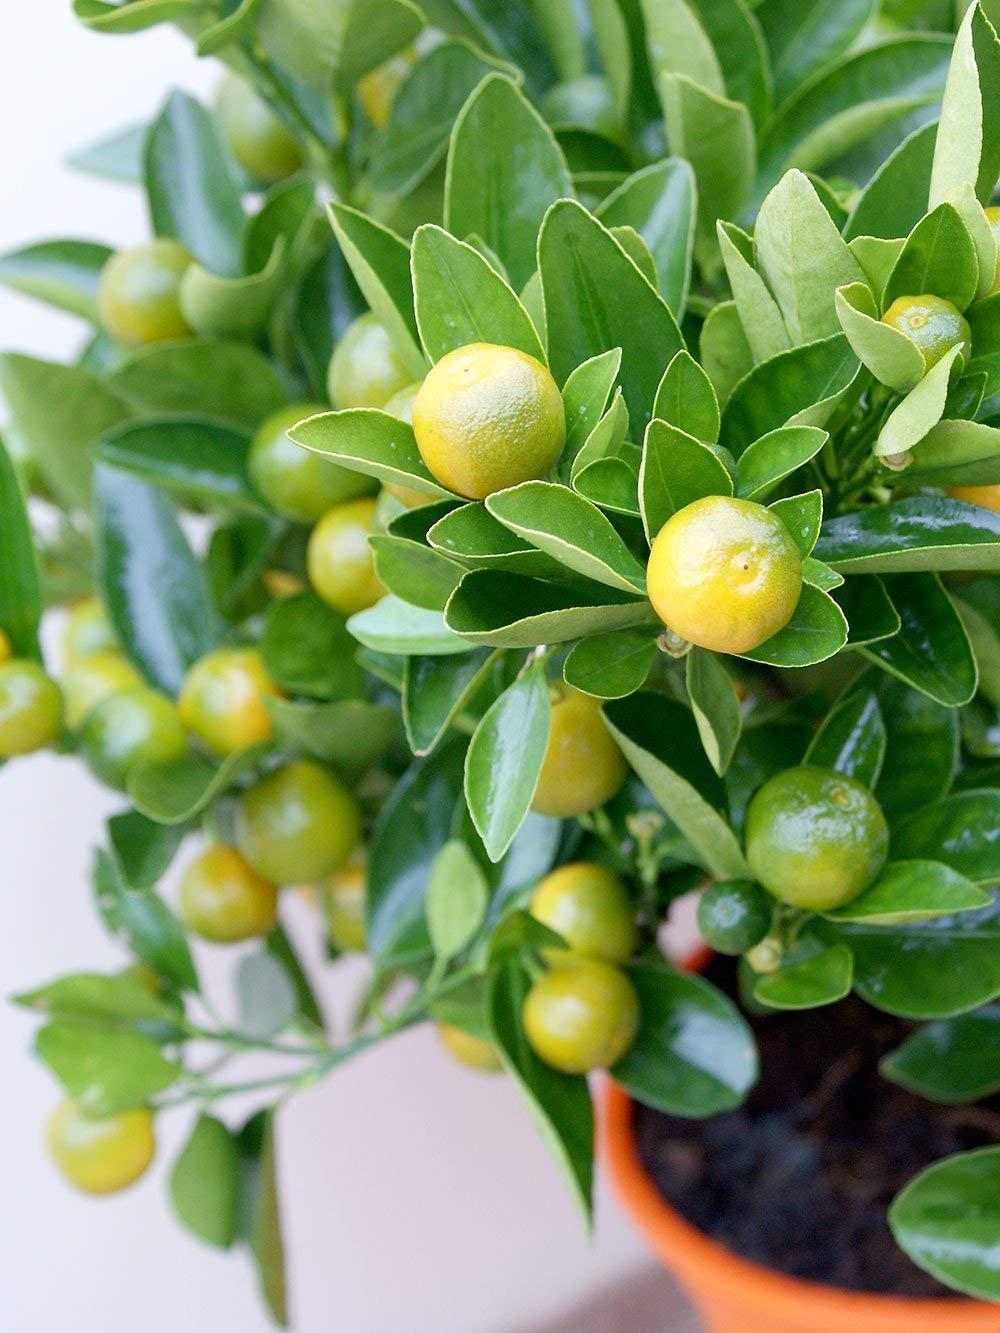 IDEA HIGH Calamondin Tree (Miniature Orange) by HATCHMATIC (Image #2)